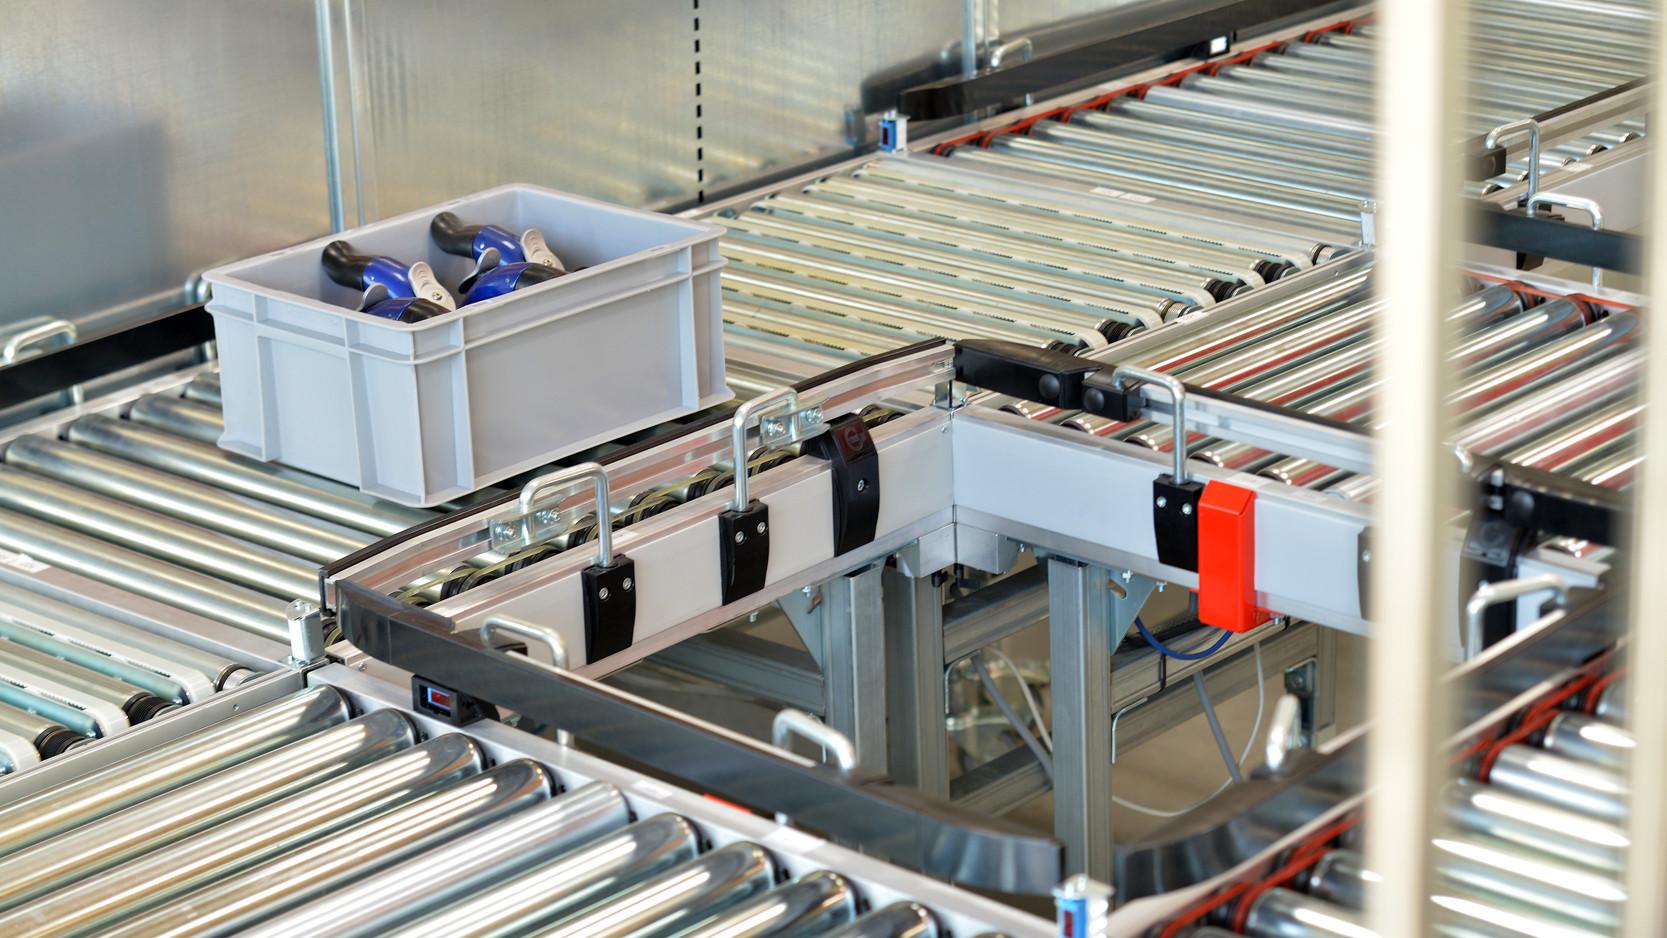 Decentrally controlled roller conveyor system - Gebhardt FlexConveyor